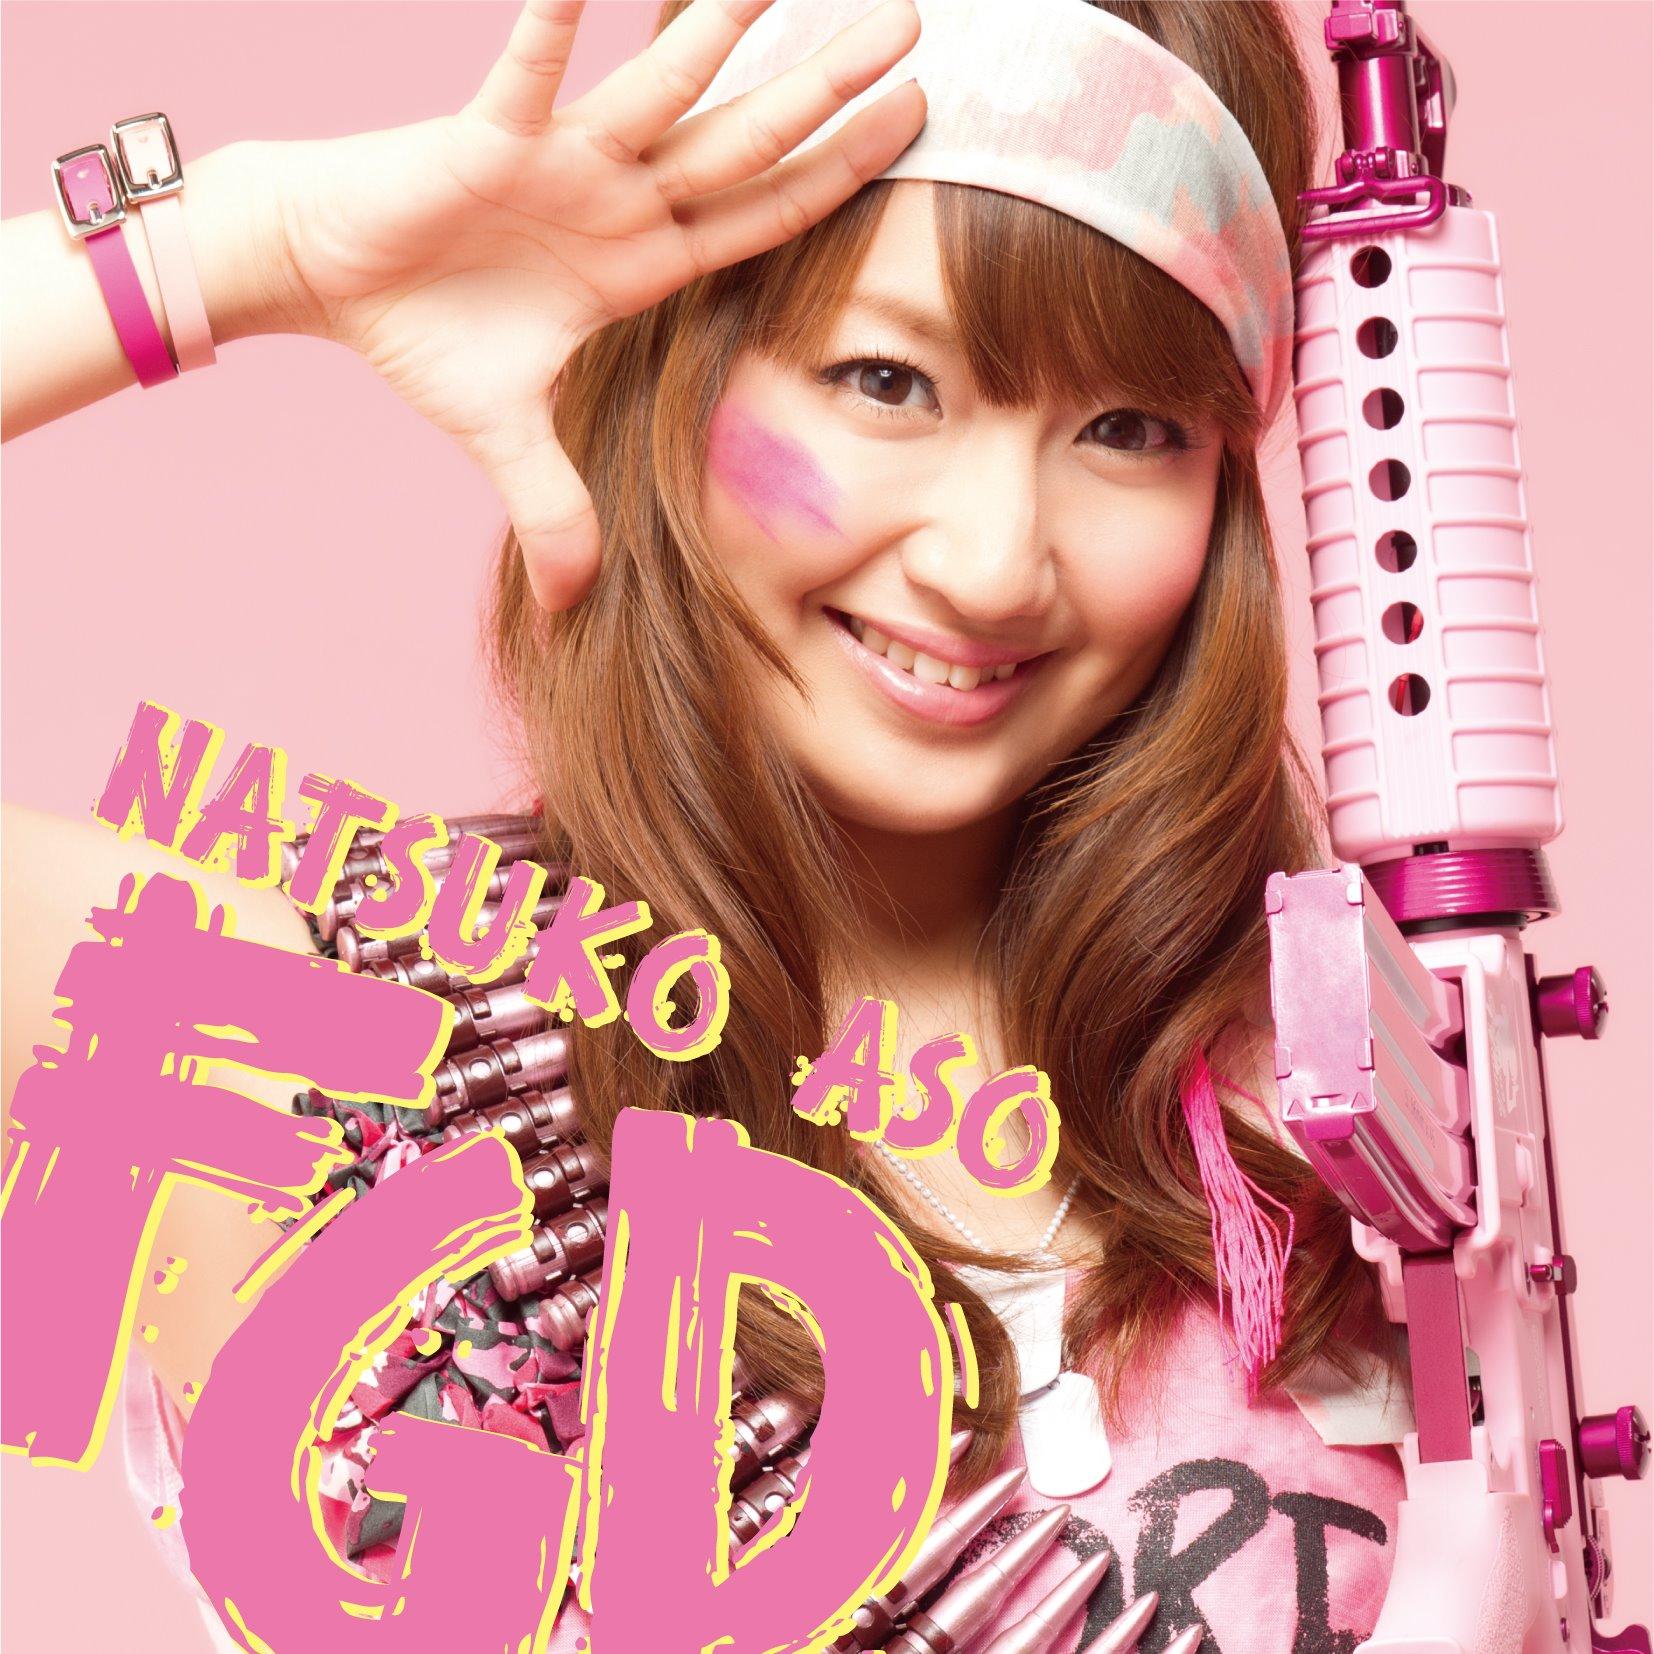 20170120.44.20 Natsuko Aso - Fighting Growing Diary cover.jpg